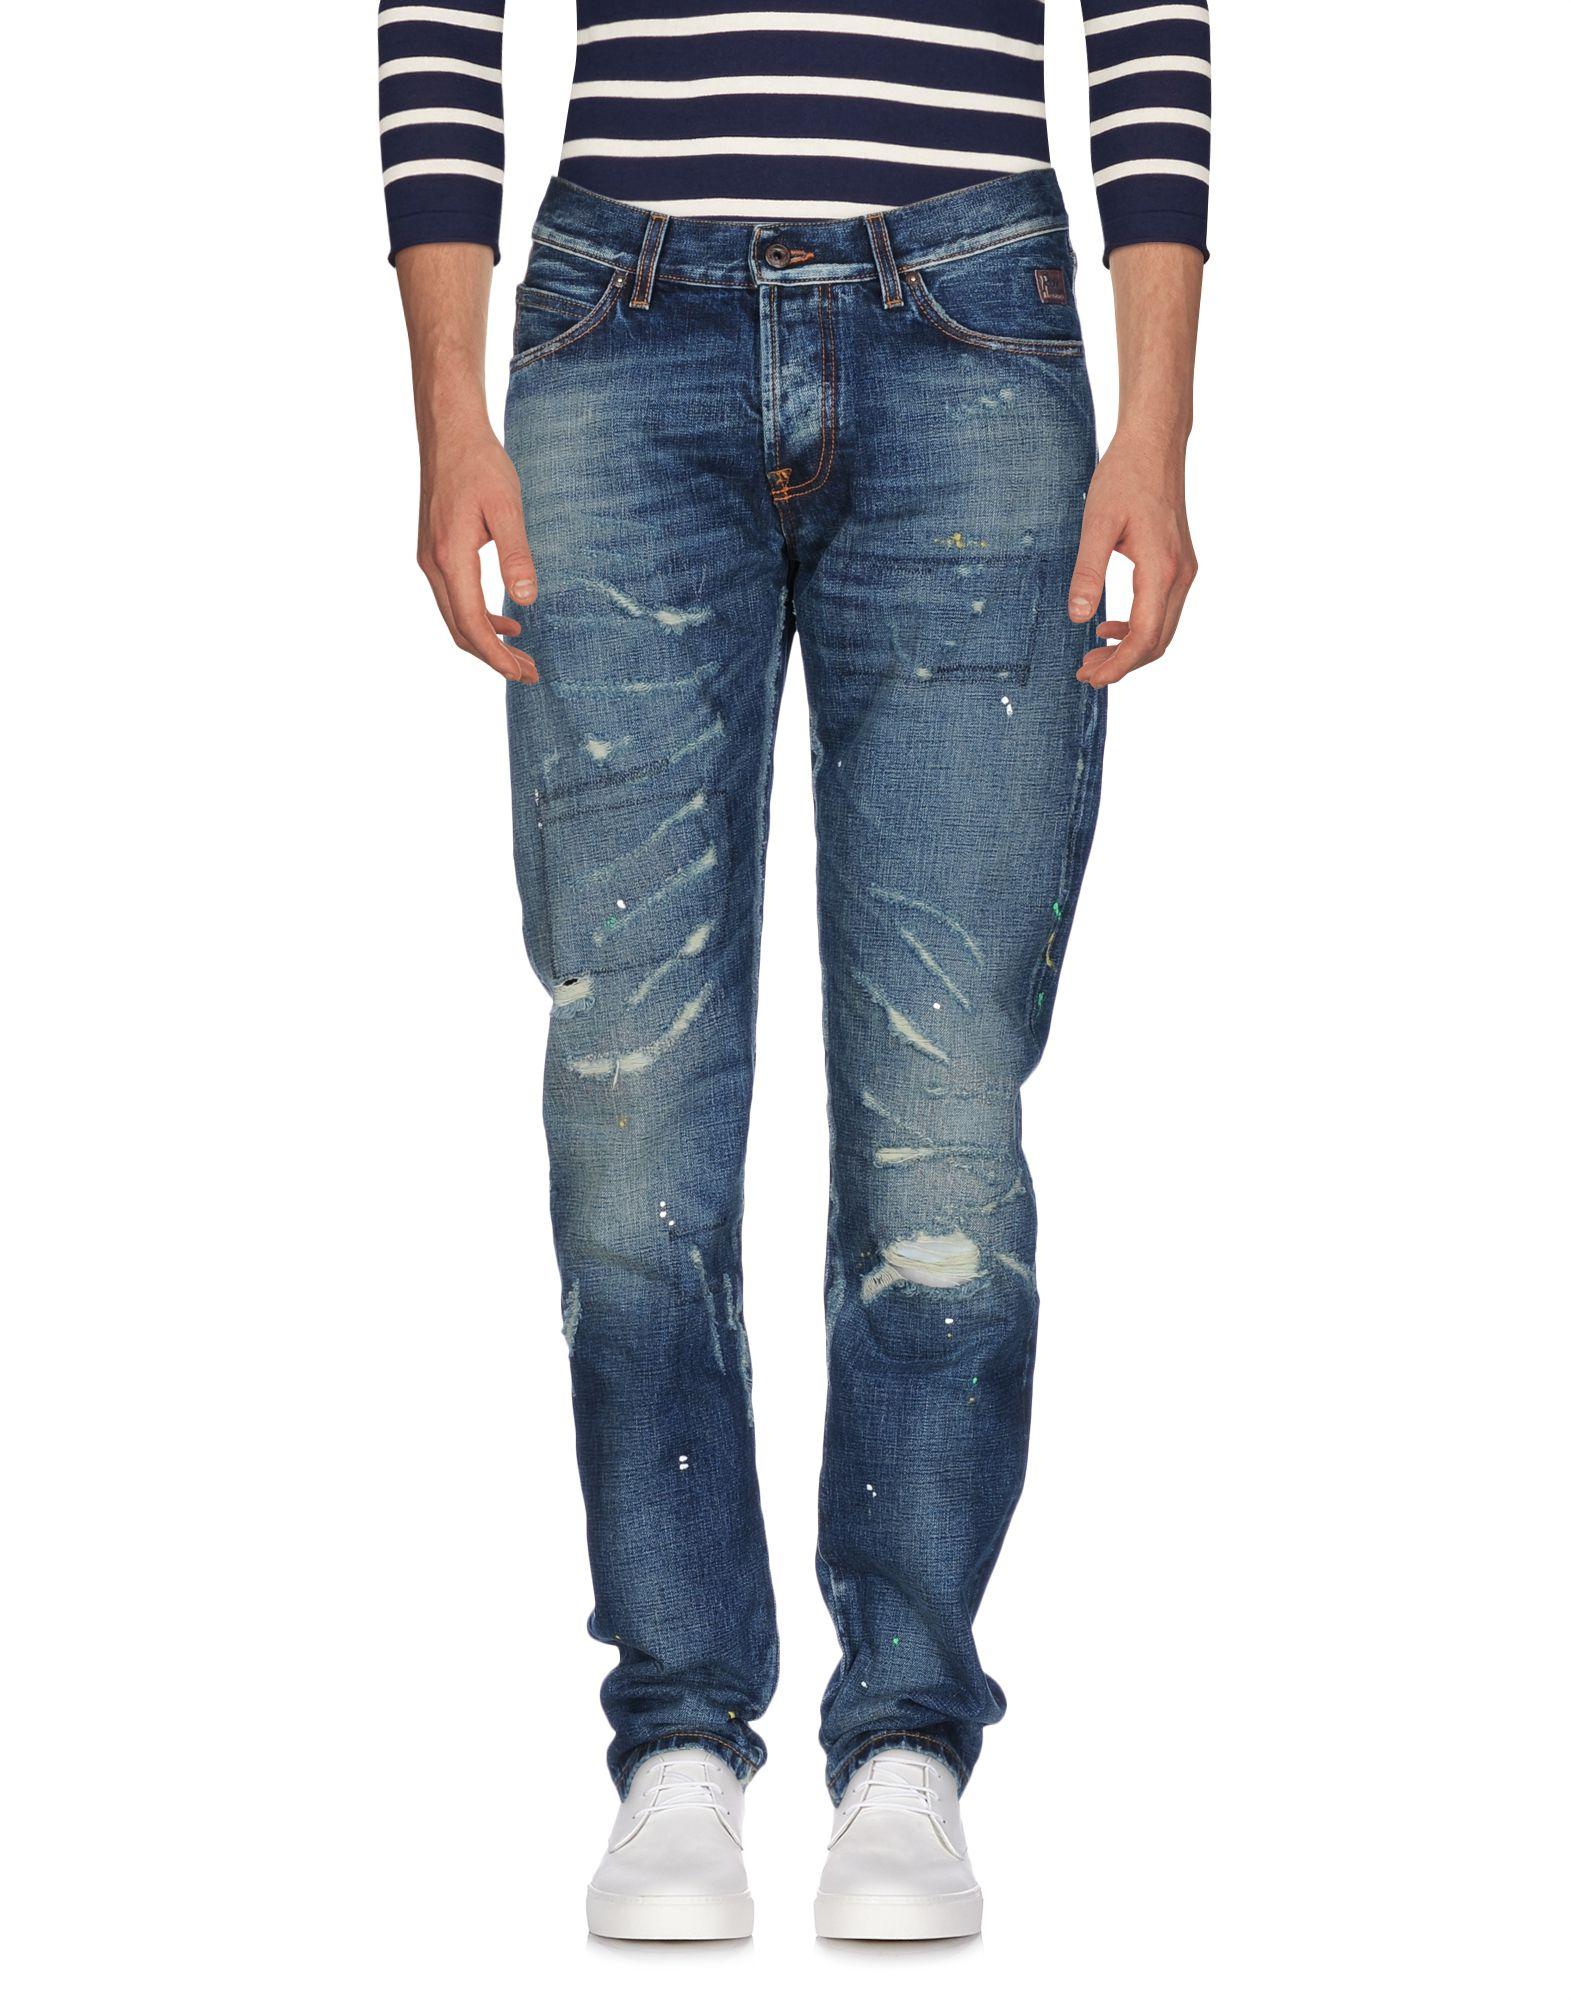 Pantaloni Jeans Roÿ Rogers Rugged Uomo - Acquista online su